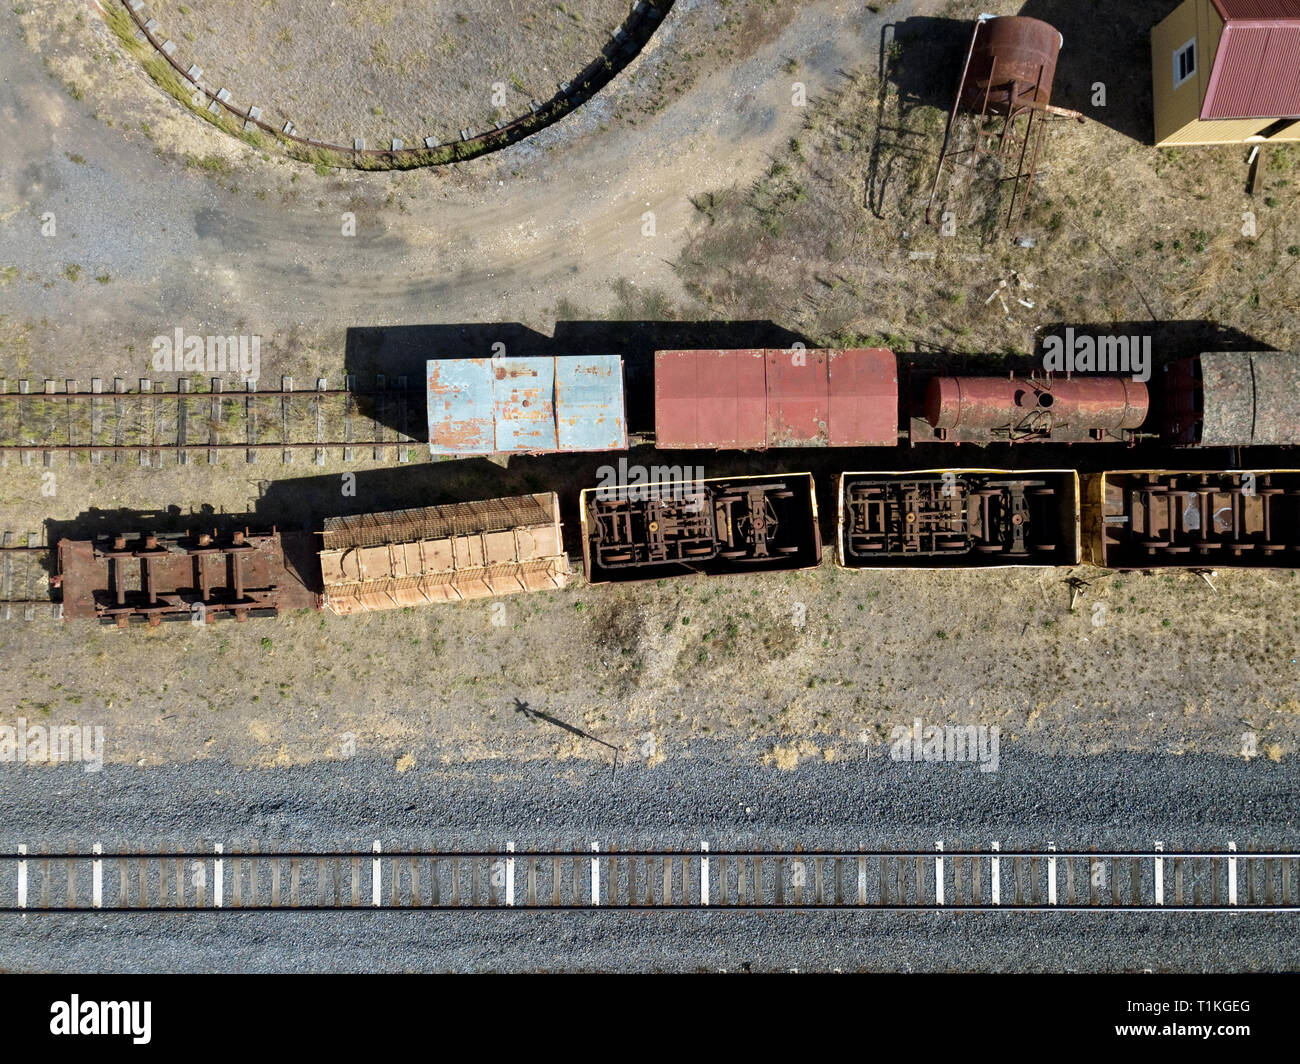 Old train tracks, train turntable, train yard cars and train yard above aerial view next to modern day train line. Victoria, Australia. - Stock Image